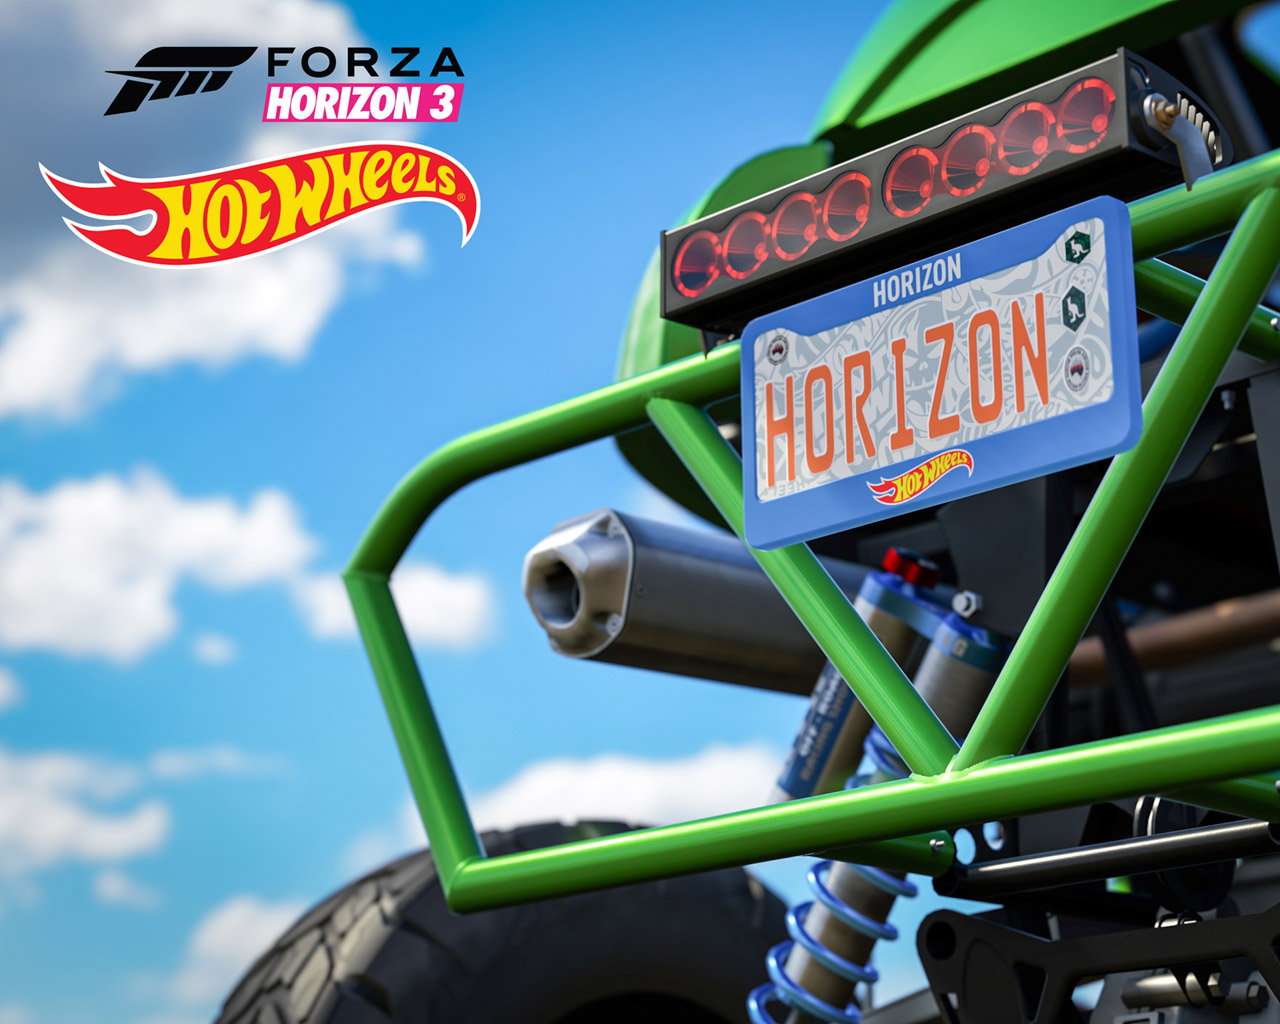 Forza Horizon 3 Wallpaper in 1280x1024